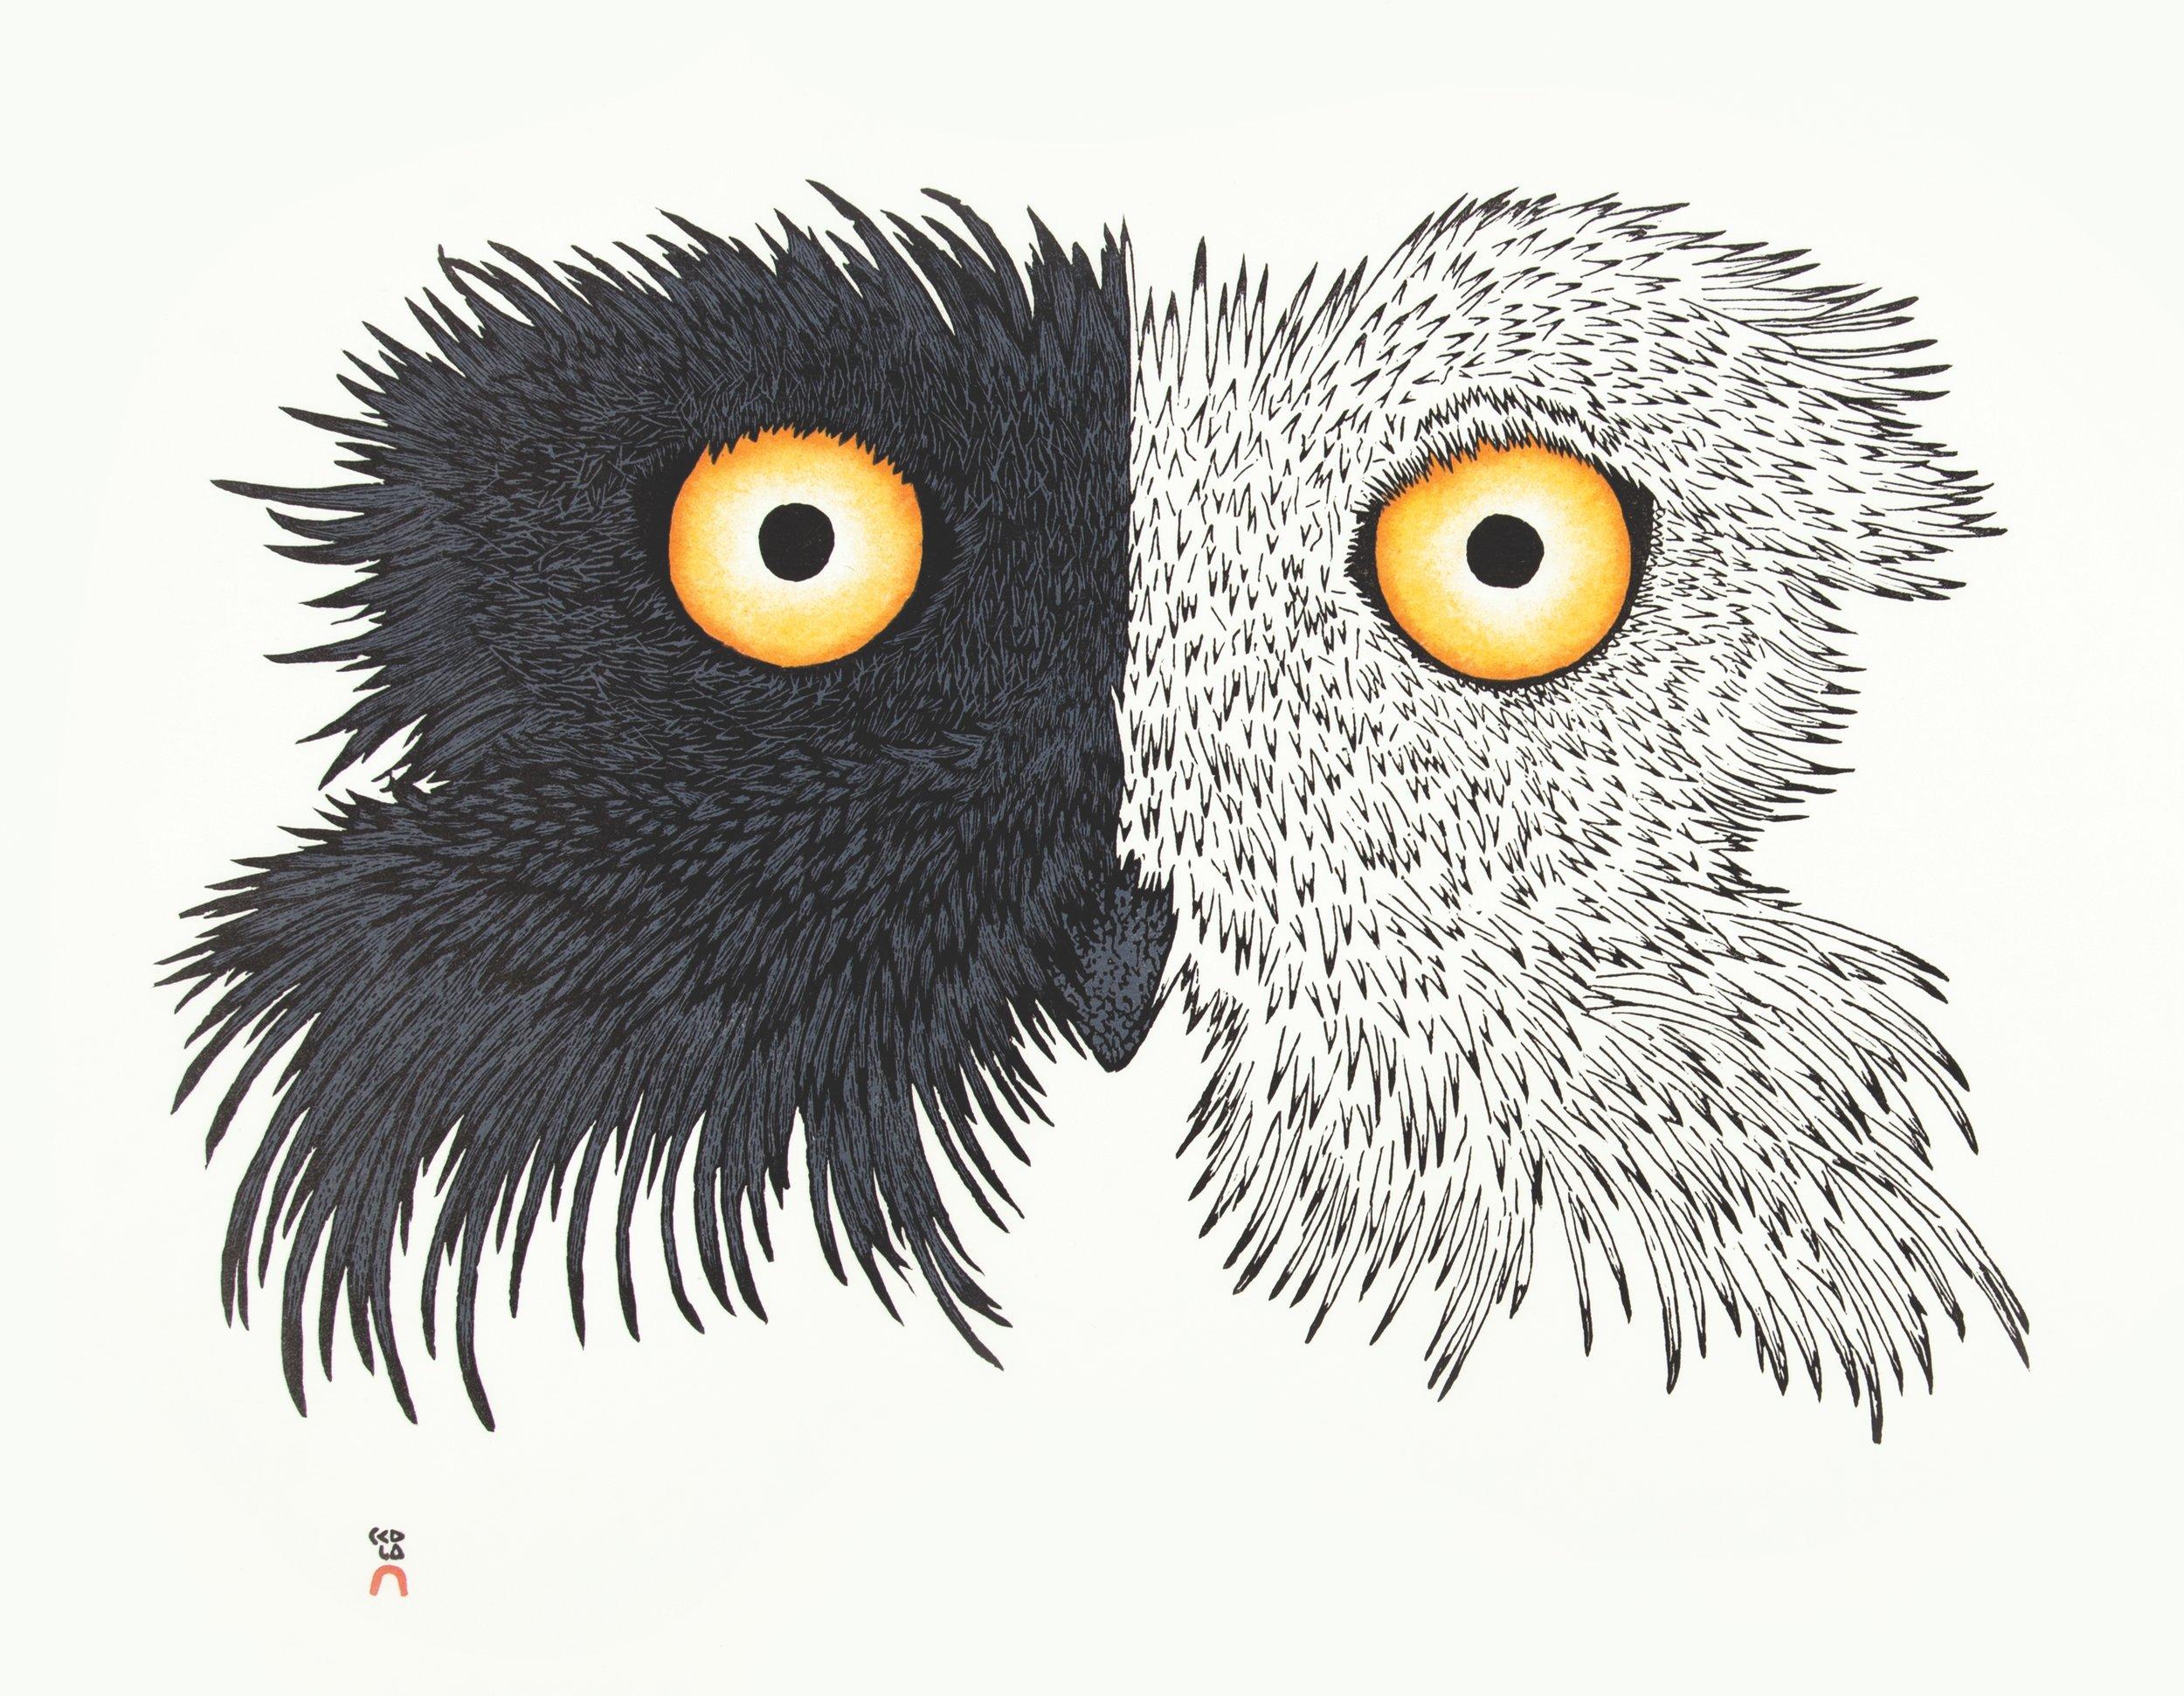 PADLOO SAMAYUALIE  18. Night & Day  Stonecut & Stencil  Paper: Kizuki Kozo White  Printer: Tapaungai Niviaqsi  48 x 61.5 cm  $ 800